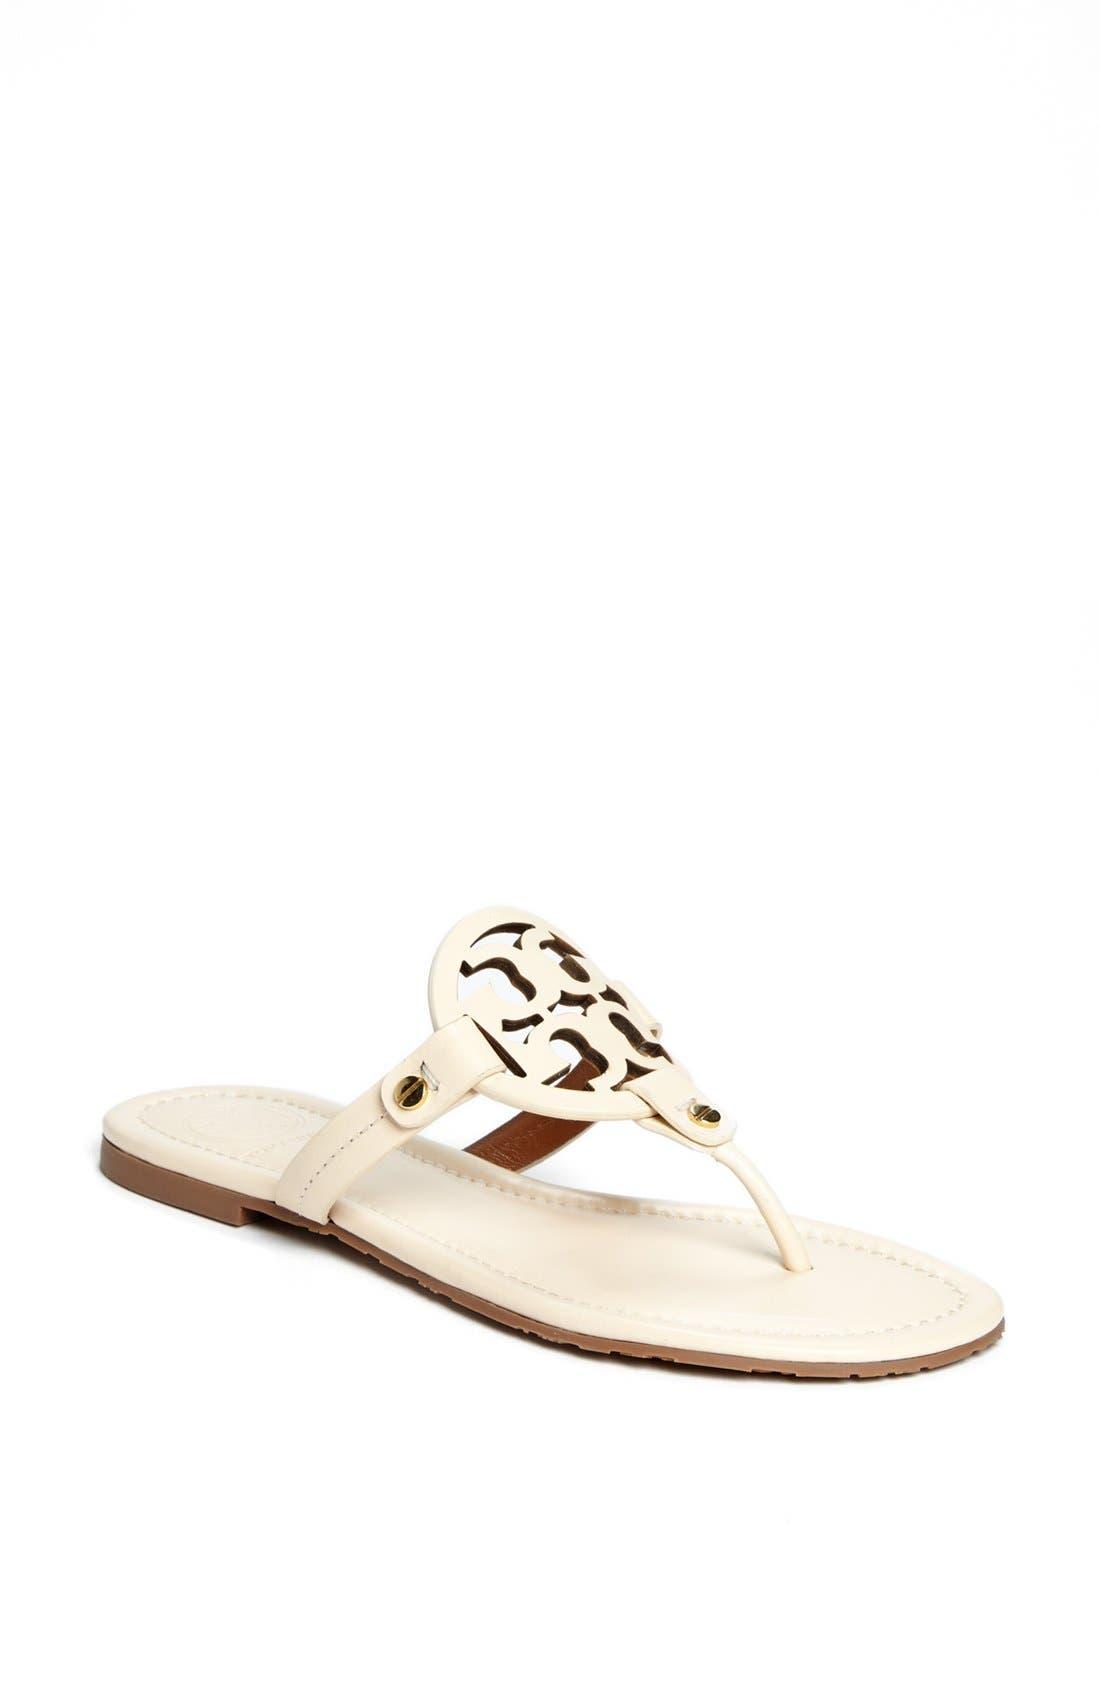 Alternate Image 1 Selected - Tory Burch 'Miller' Thong Sandal